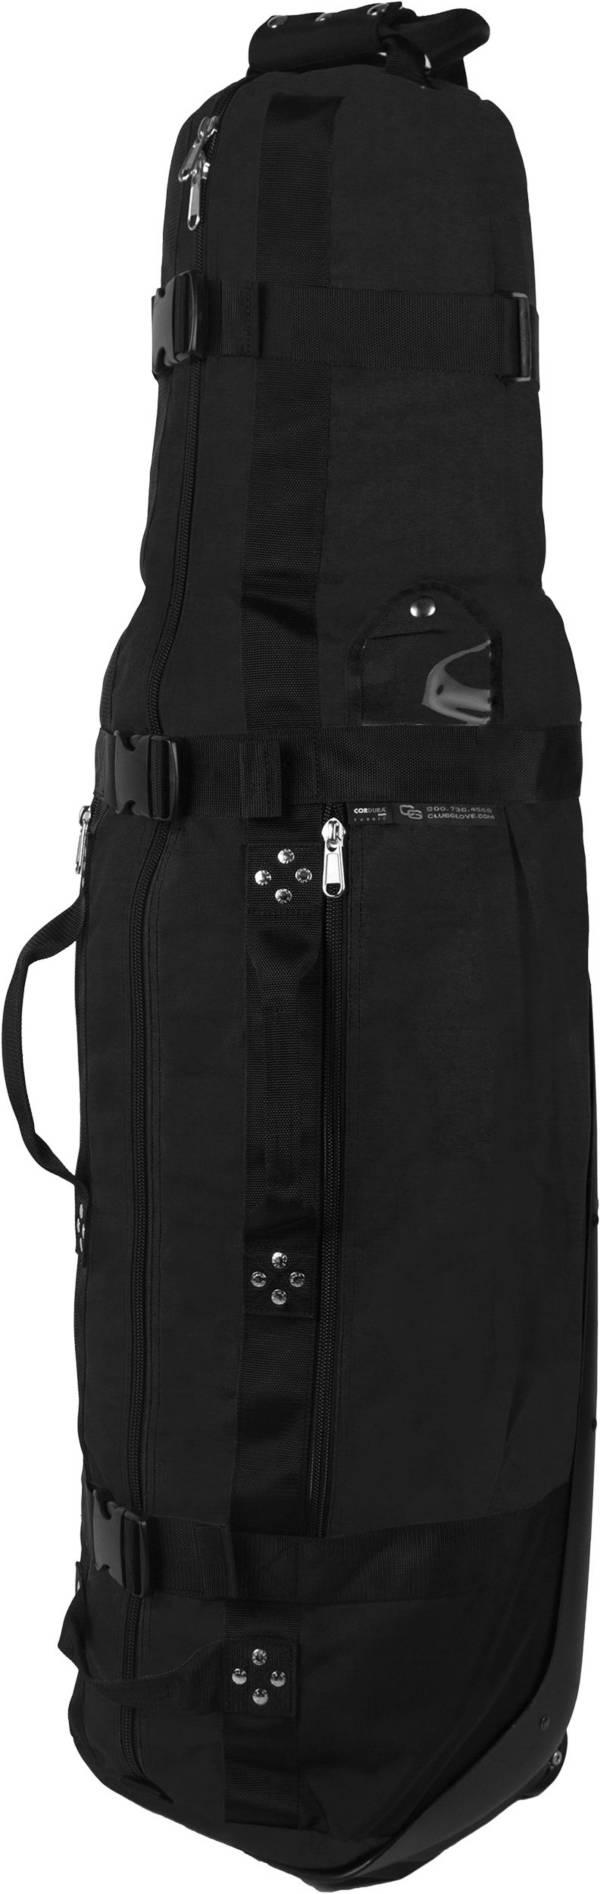 Club Glove Last Bag Collegiate Travel Cover product image